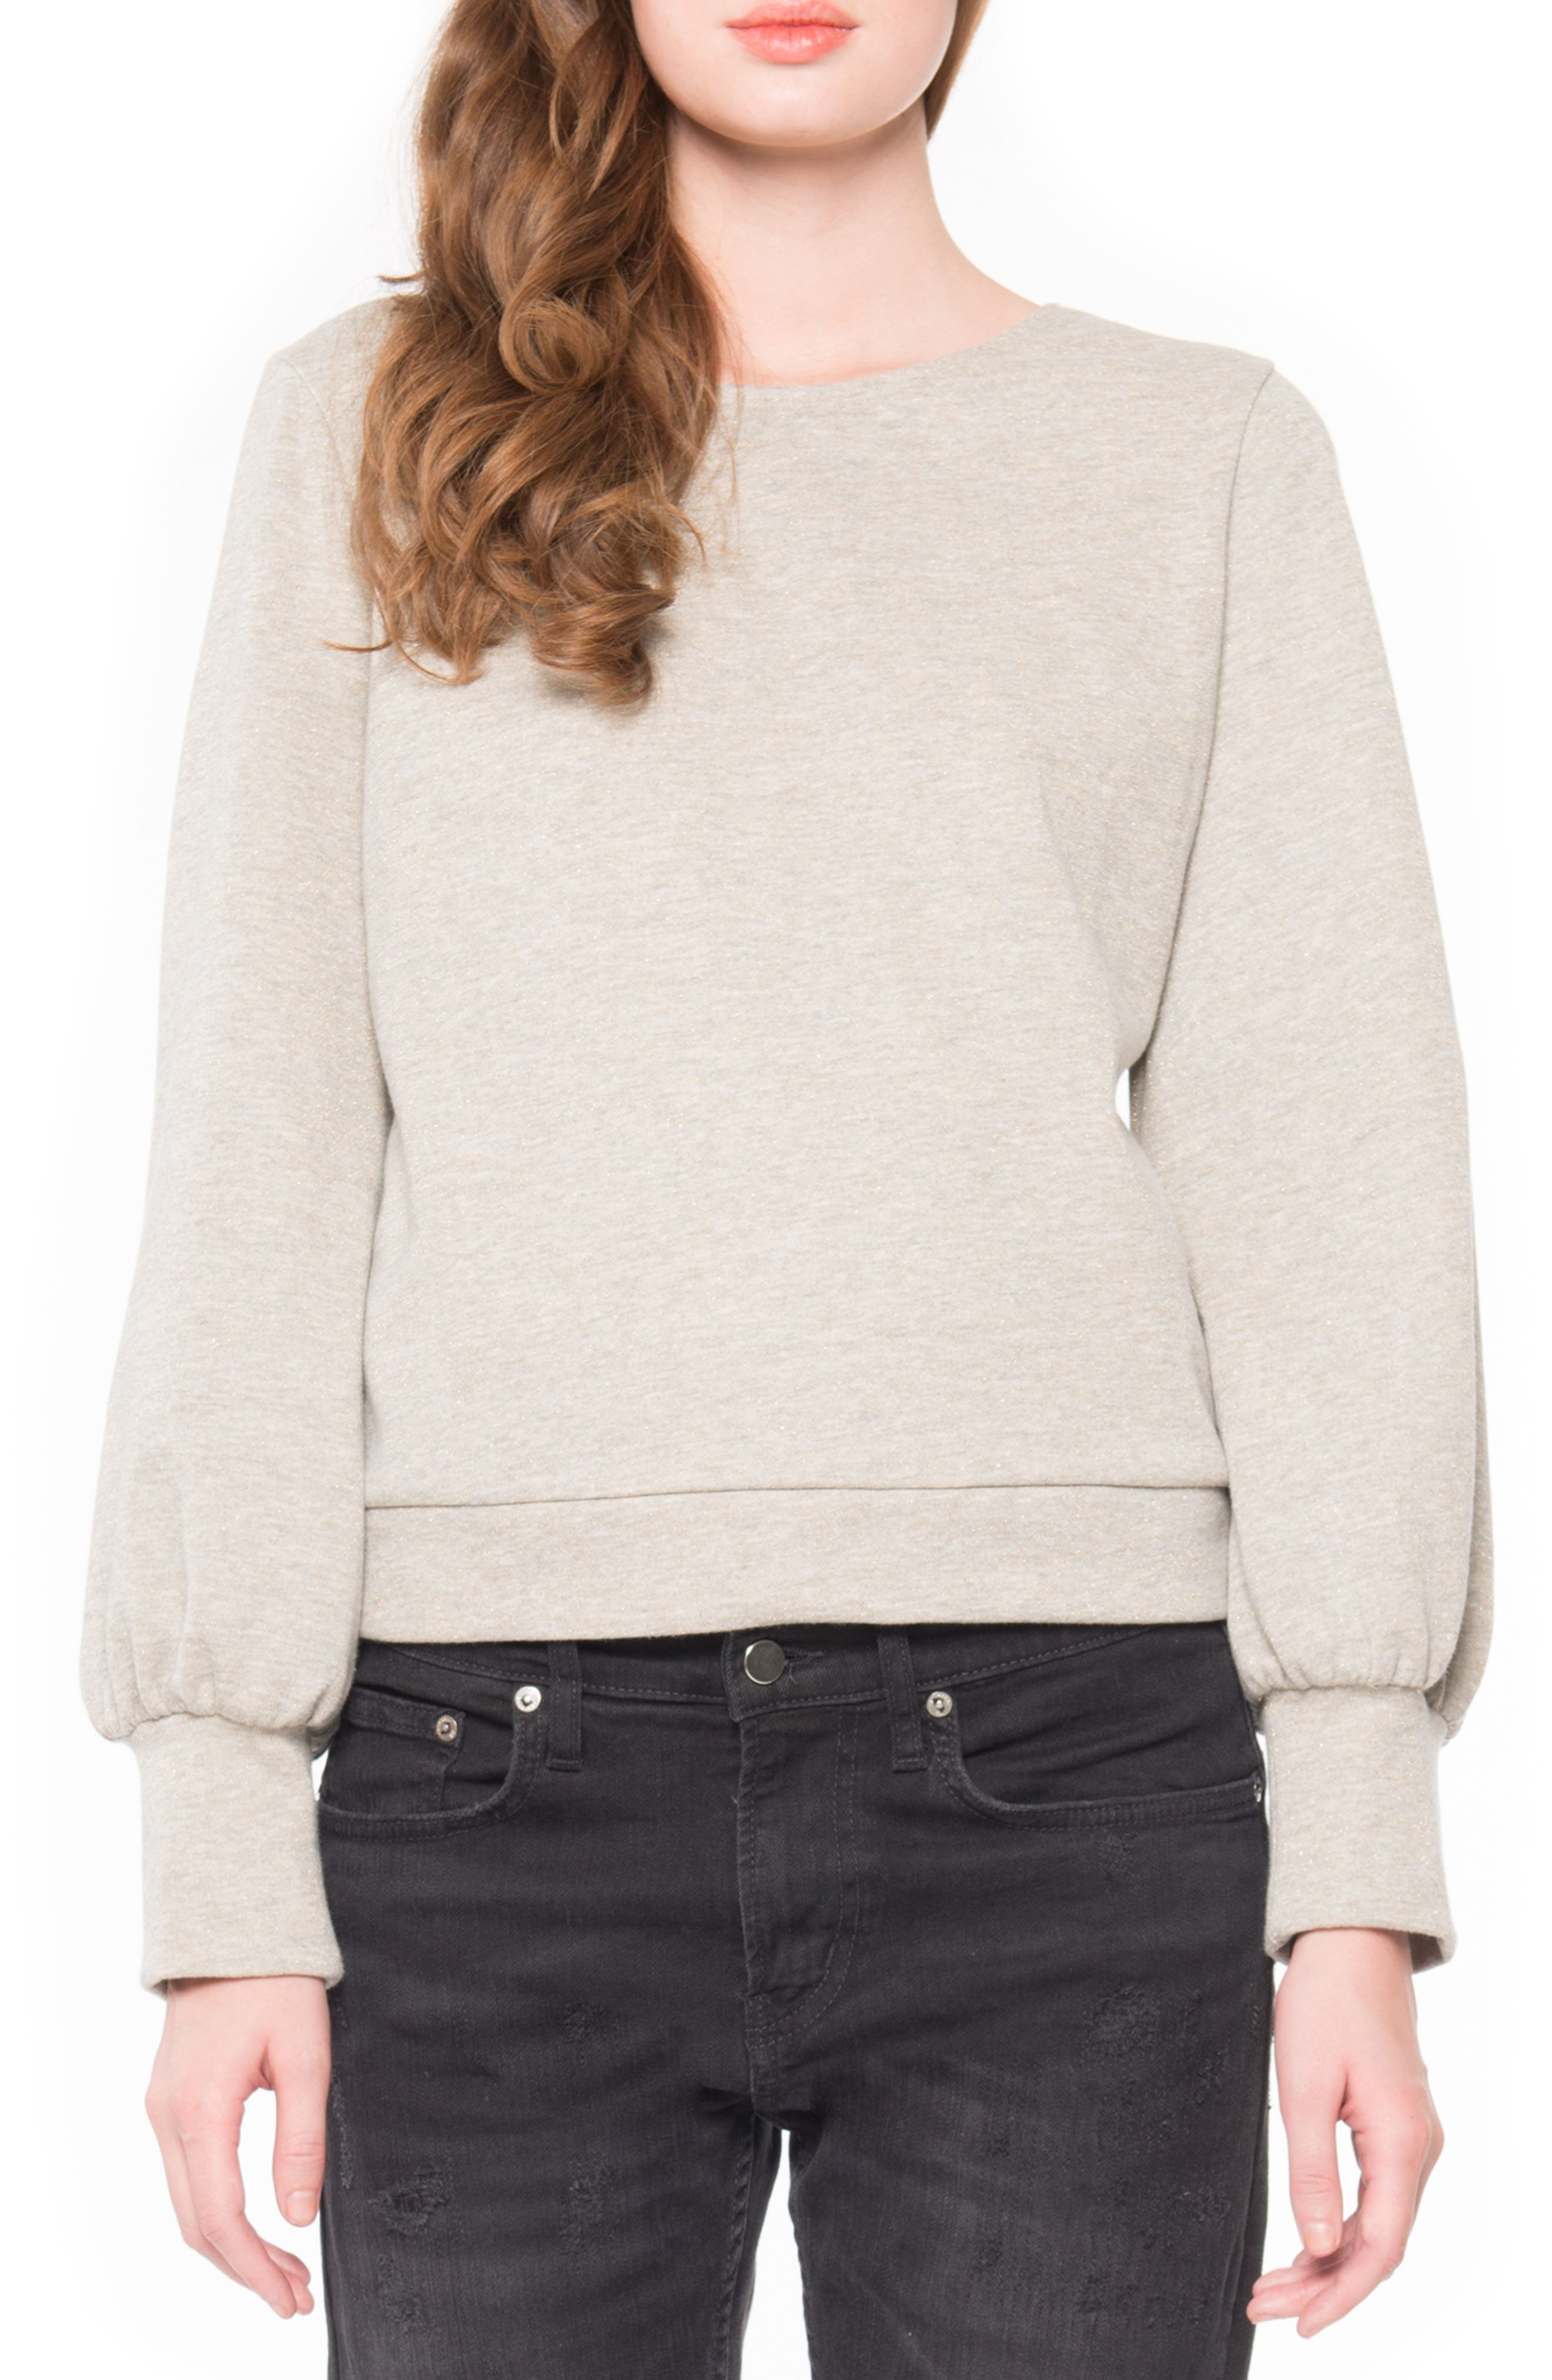 Alternate Image 1 Selected - Willow & Clay Tie Back Sweatshirt